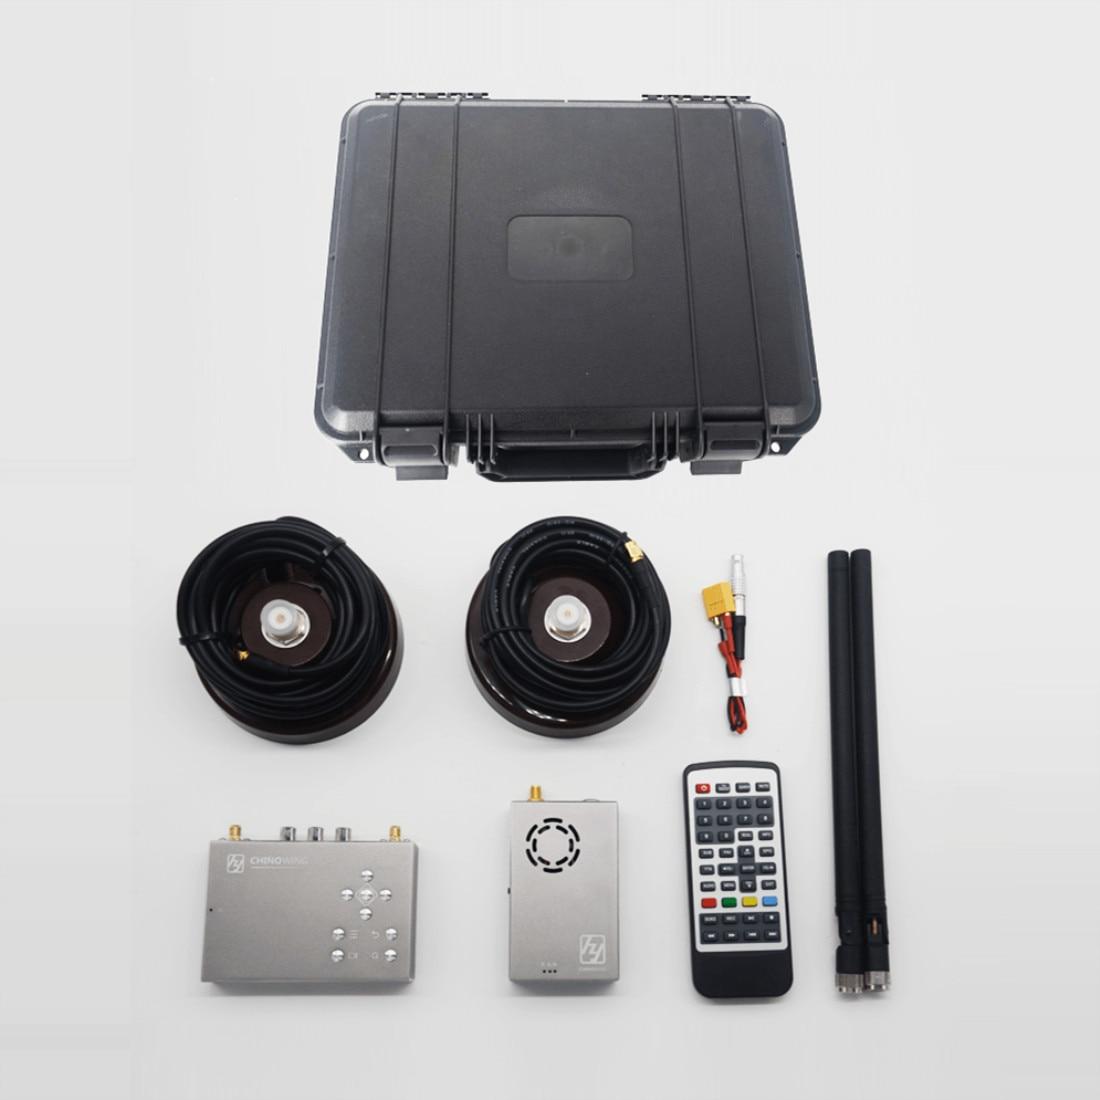 Over 30KM Wireless HDMI image Transmission 100-900Mhz Full HD 1080P COFDM Digital FPV Wireless Video Transmitter 17